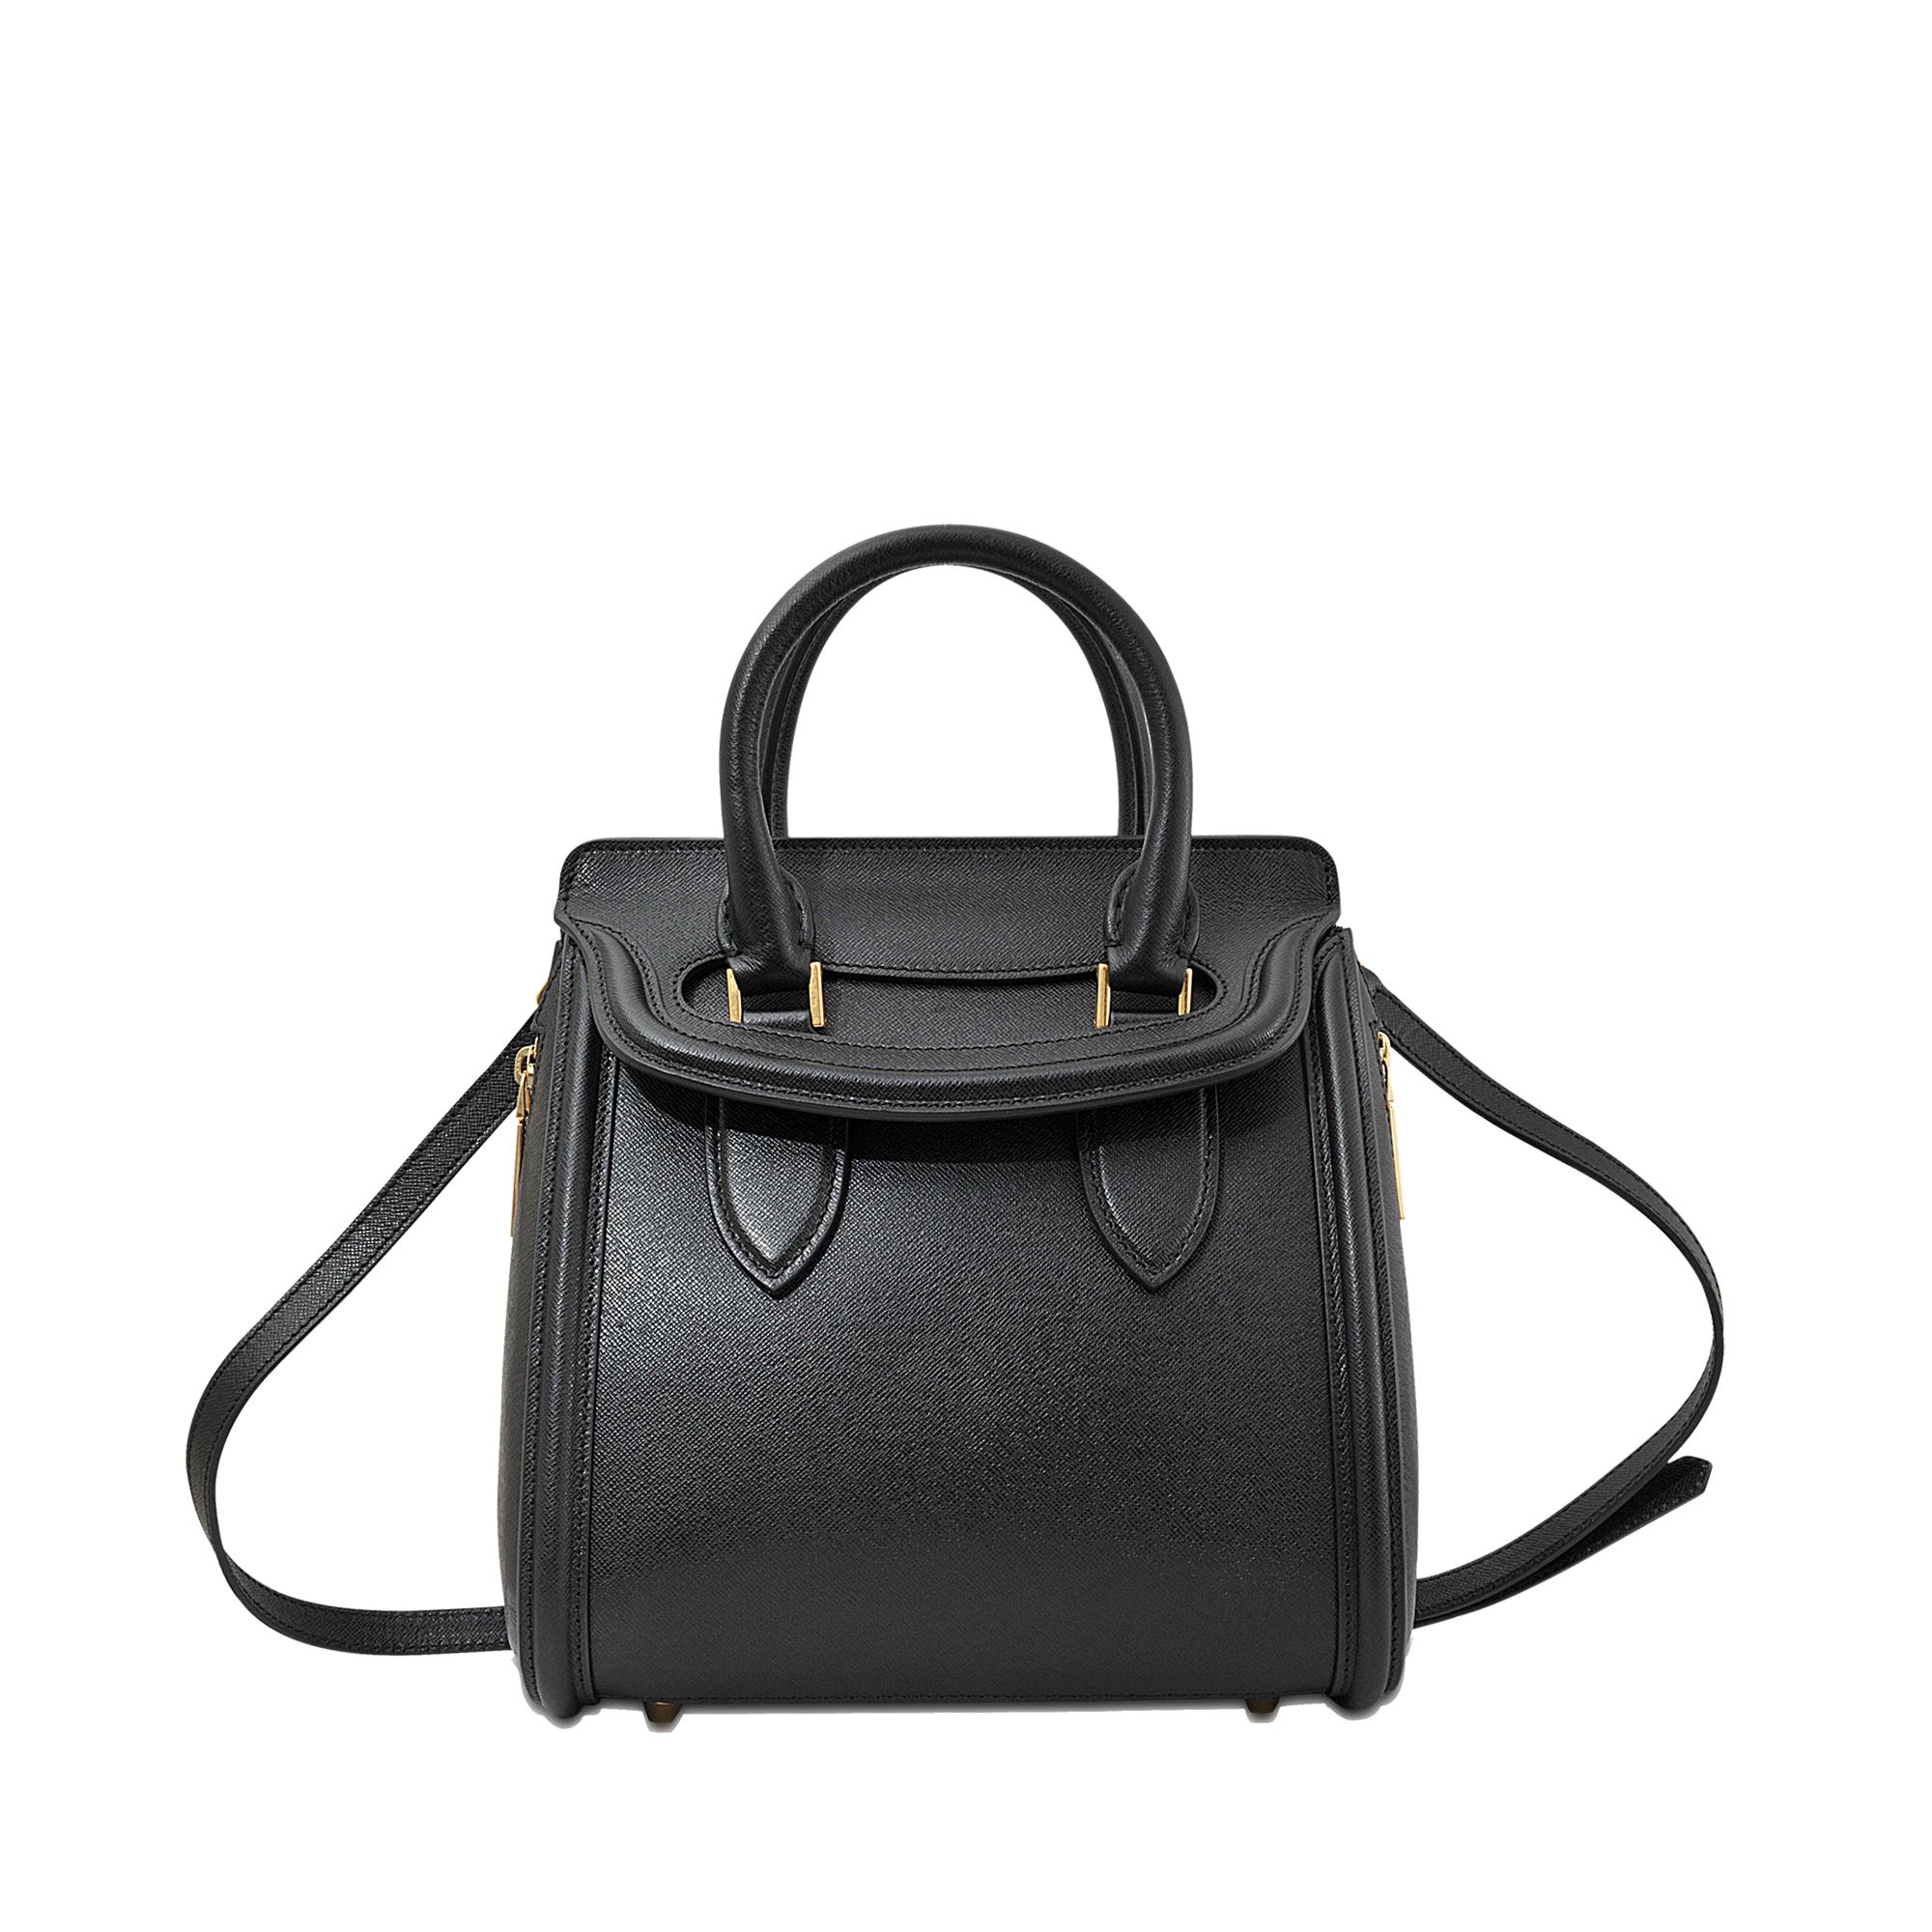 lyst alexander mcqueen small heroine bag in black. Black Bedroom Furniture Sets. Home Design Ideas